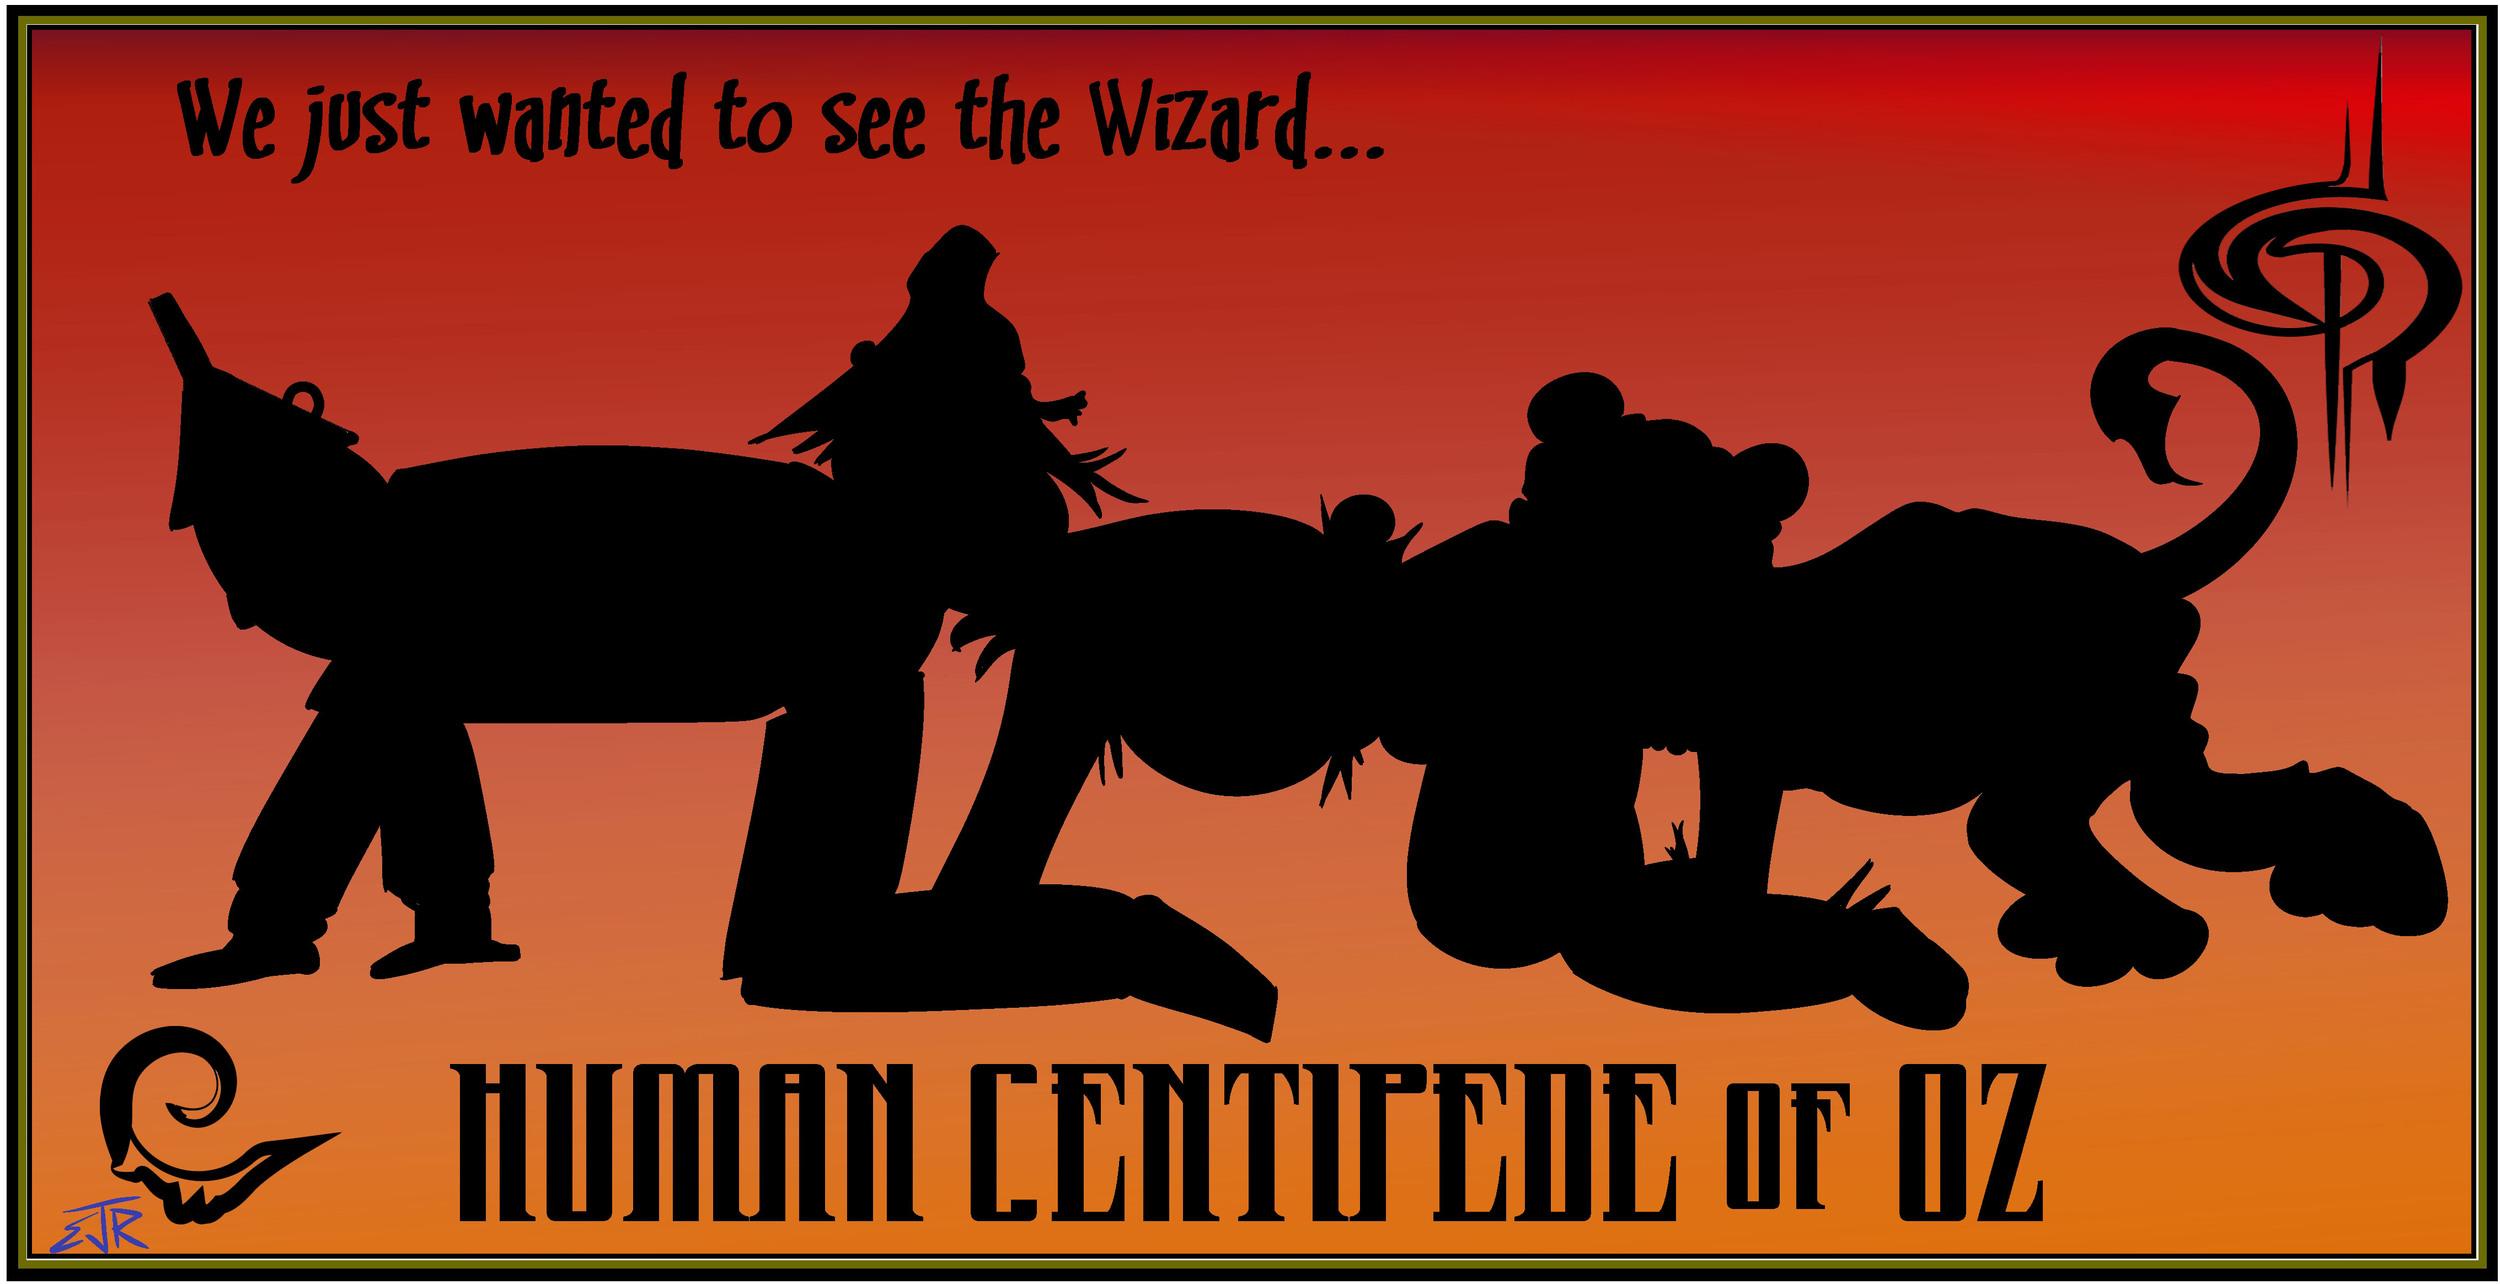 Human Centipede of Oz by Erik Roggeveen